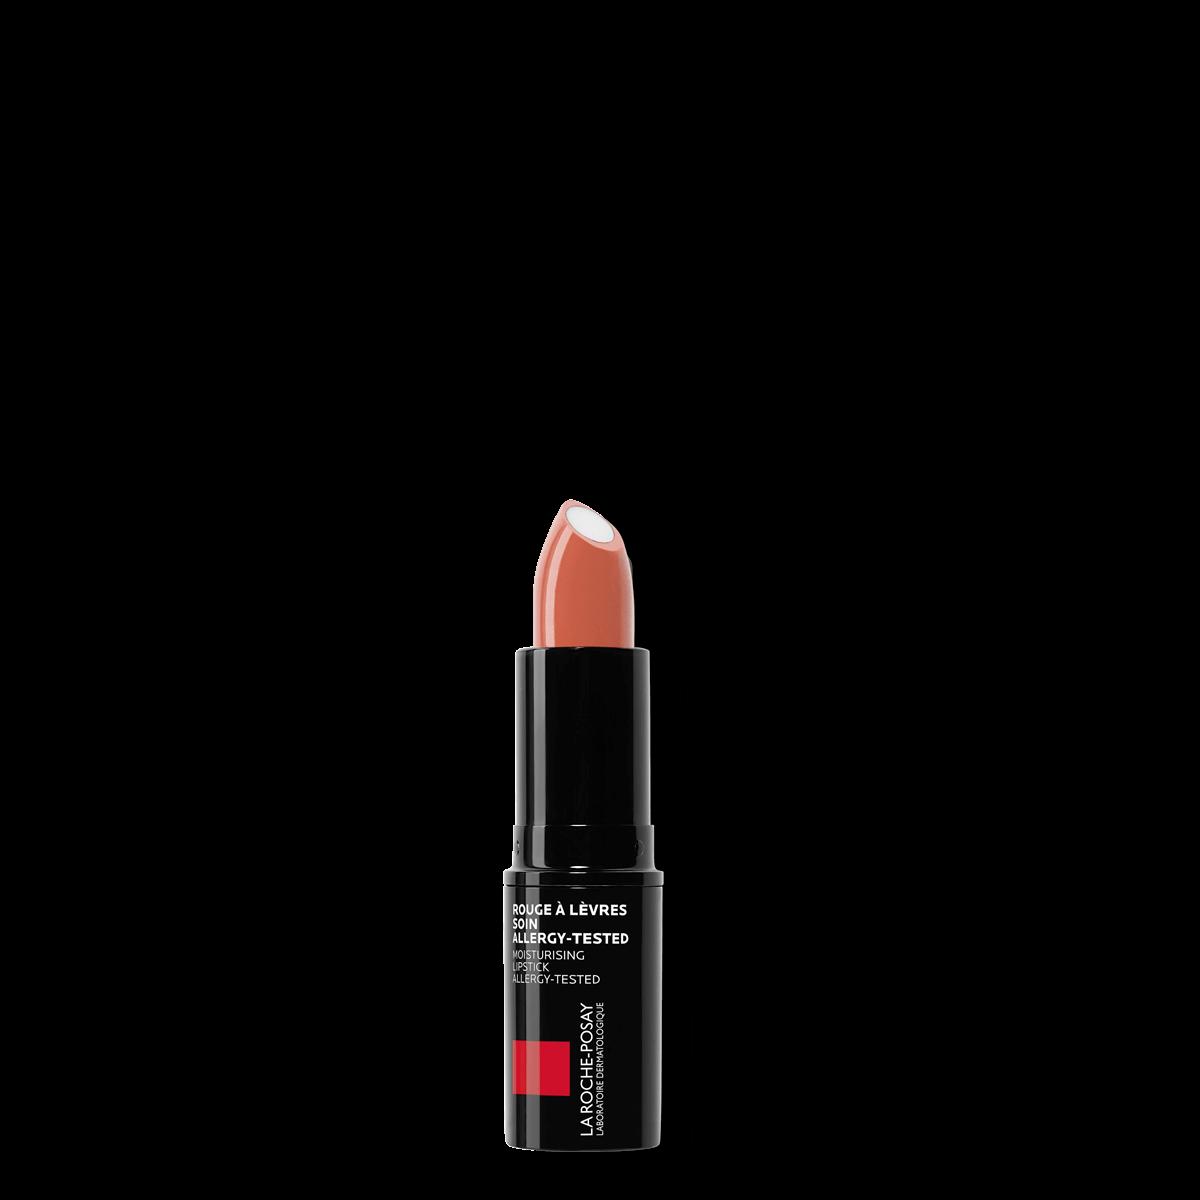 La Roche Posay Känslig Toleriane Make up NOVALIP 170BrunSepia 300926